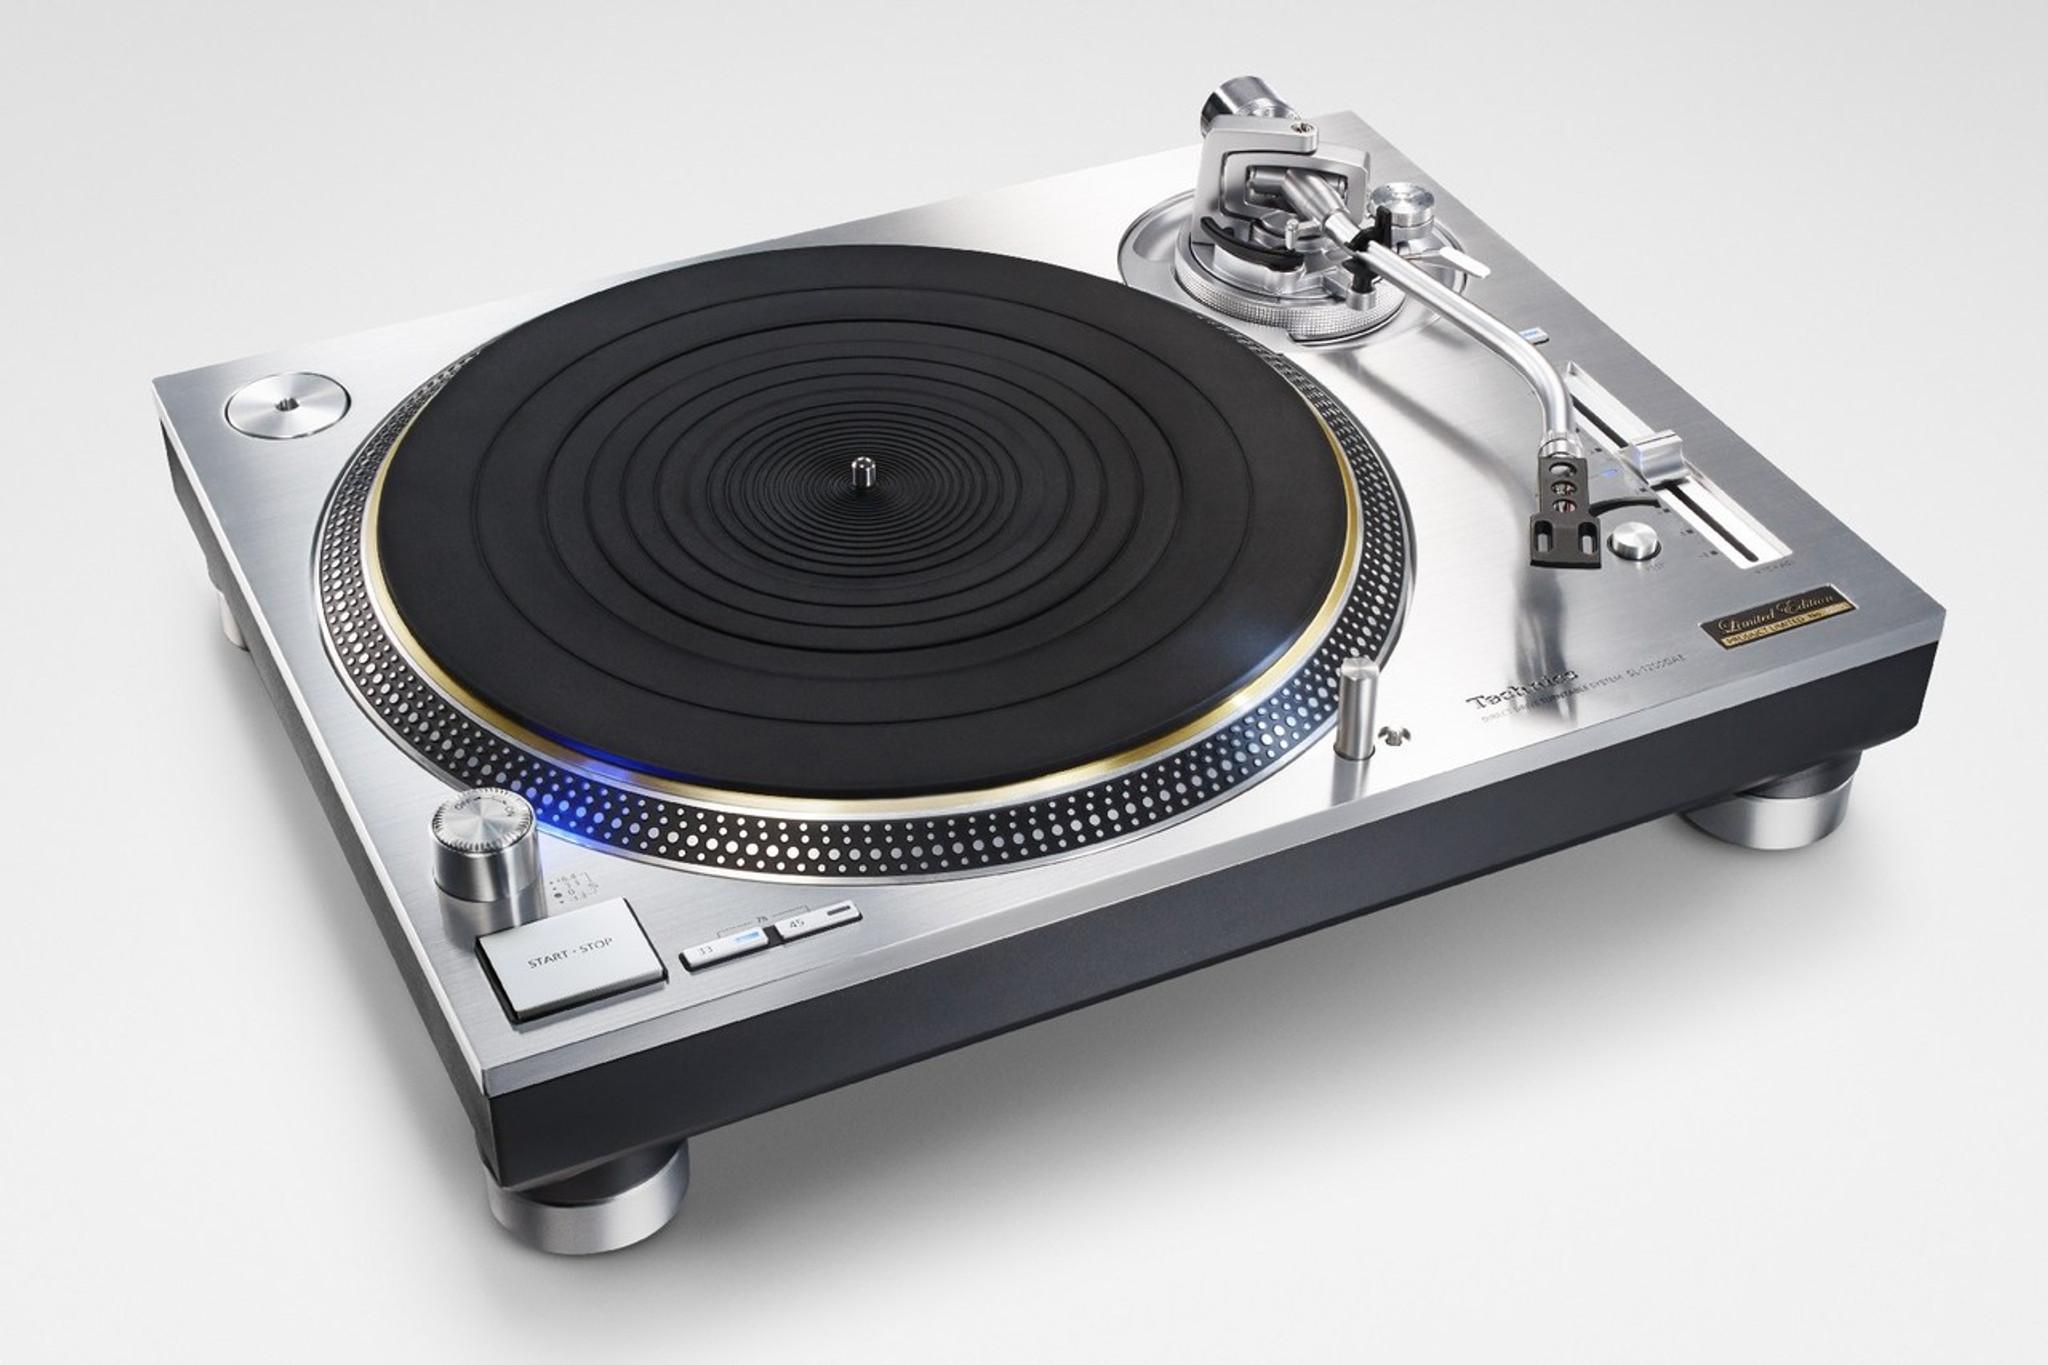 technics sl 1200mk2 silver dj turntable